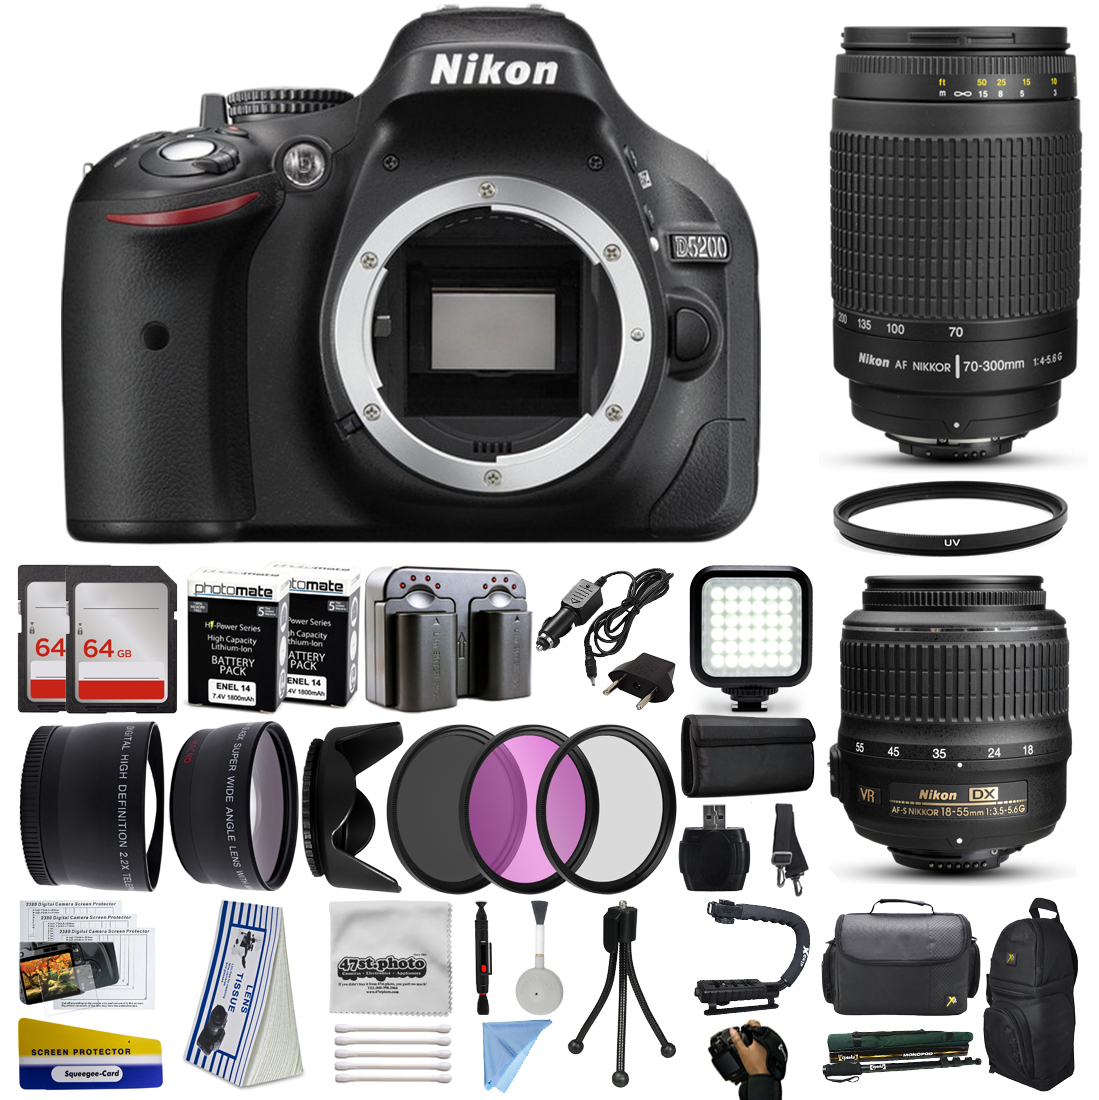 Nikon D5200 Dslr Digital Camera With 18 55mm Vr 70 300mm F 4 5 6g Lens 128gb Memory 2 Batteries Charger Led Video Light Backpack Case Filters Auxiliary Lenses More Walmart Com Walmart Com